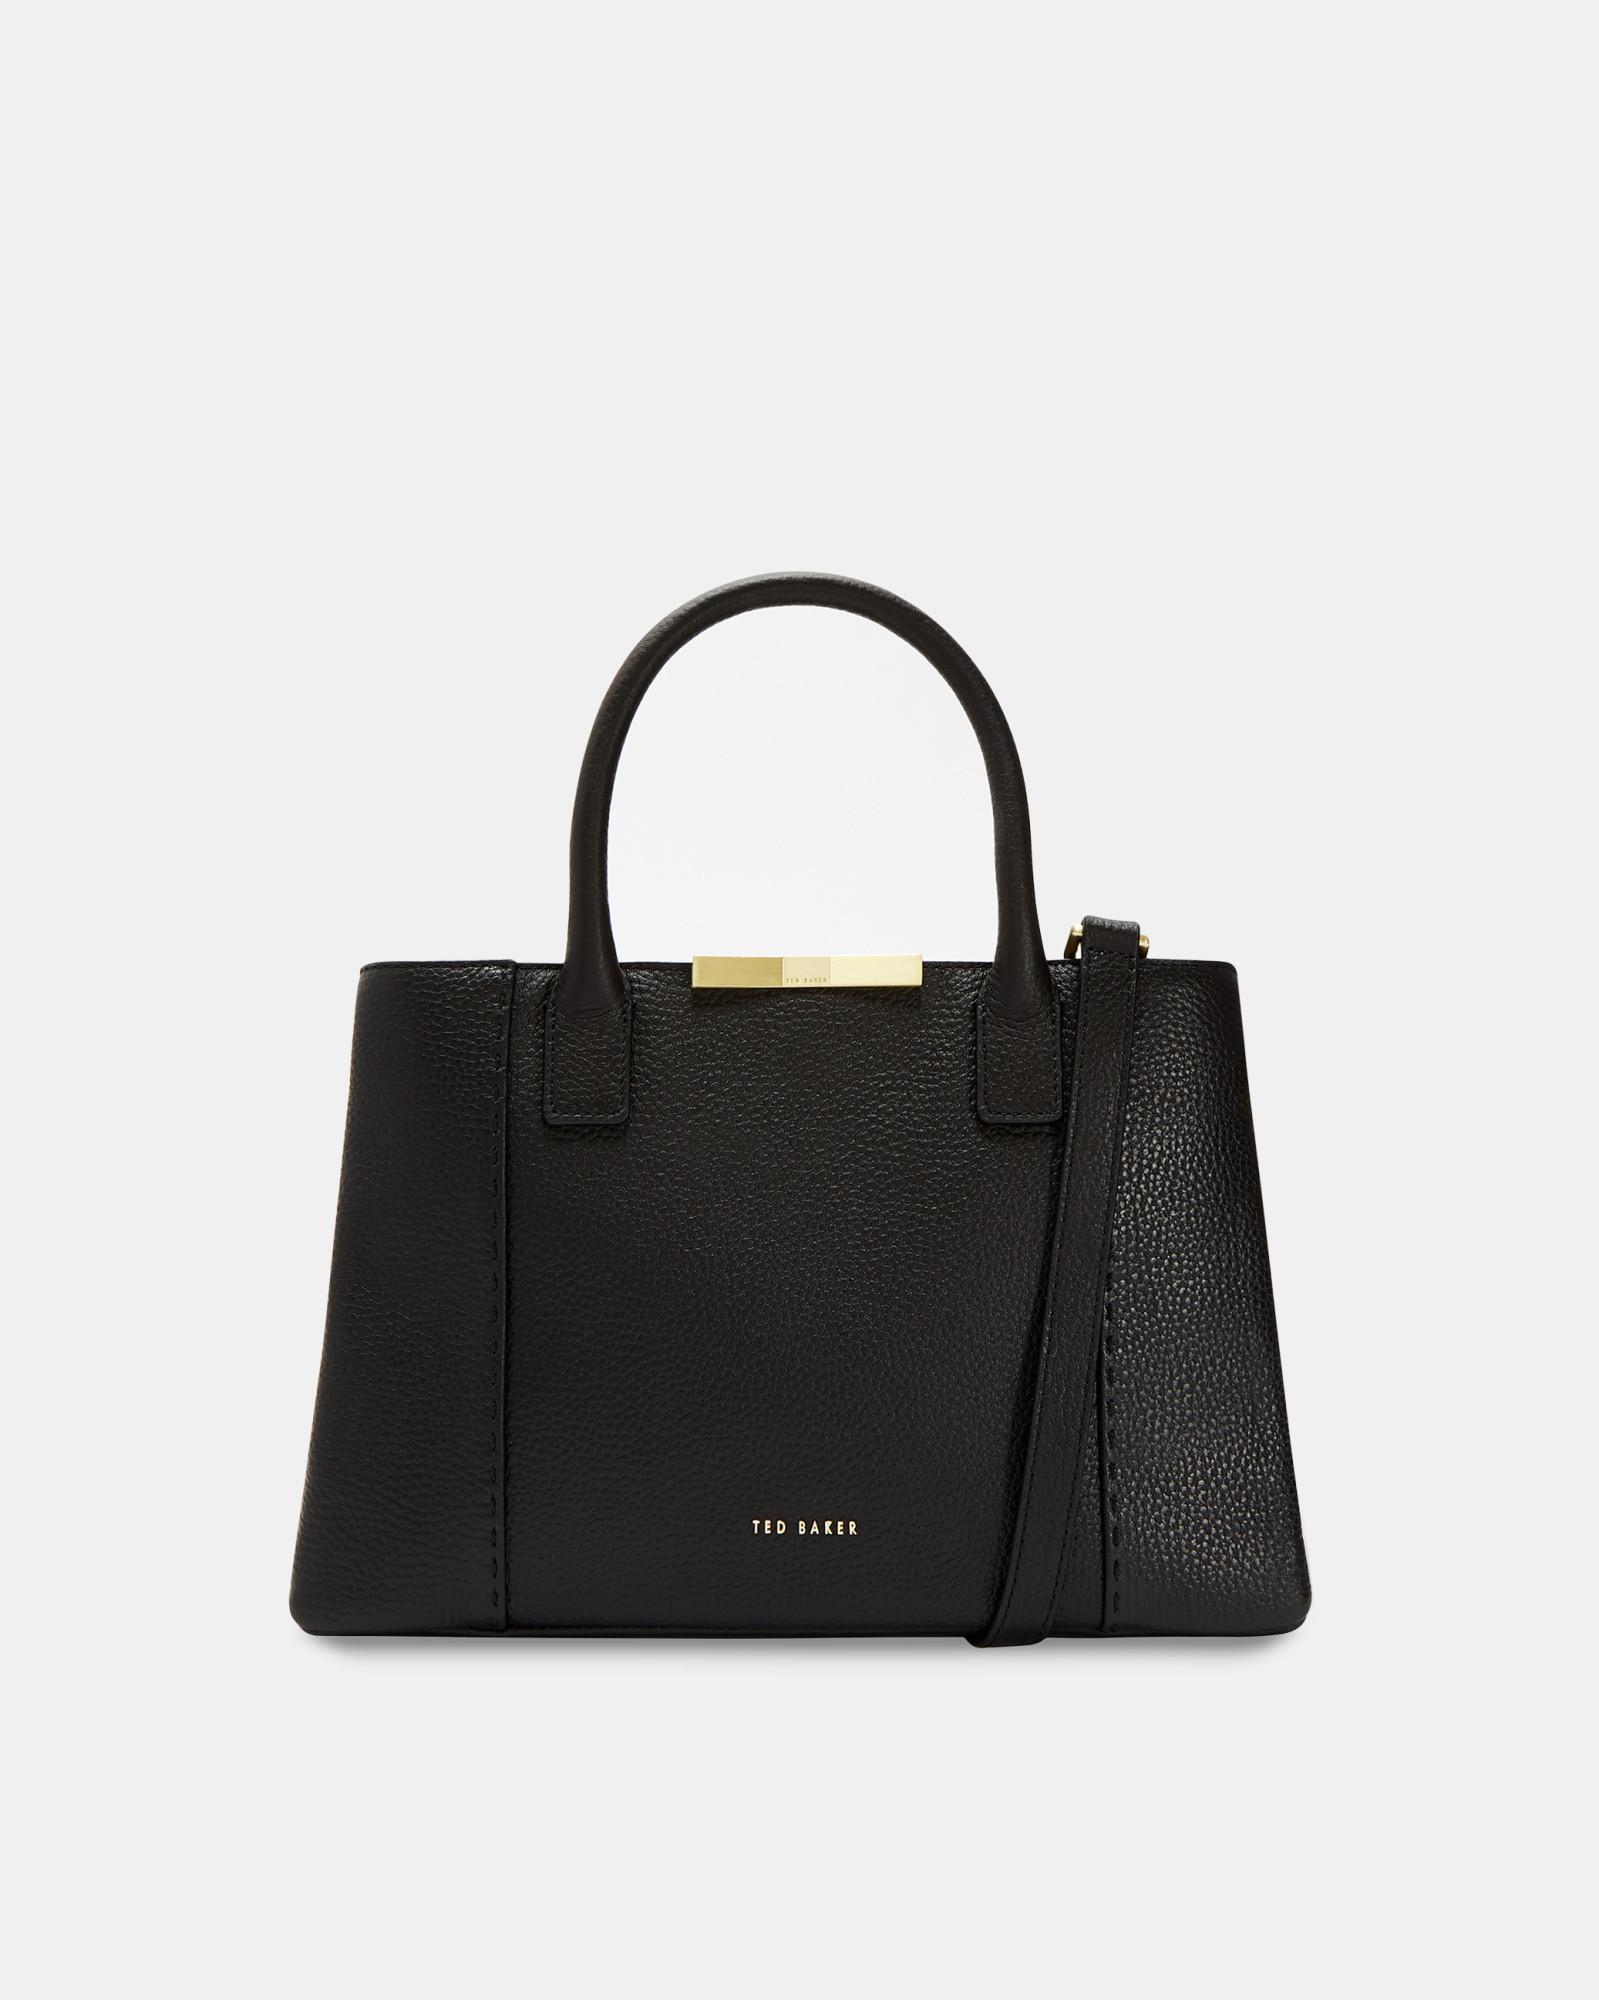 adb8cf028f3fab Ted Baker - Black Soft Leather Small Tote Bag - Lyst. View fullscreen